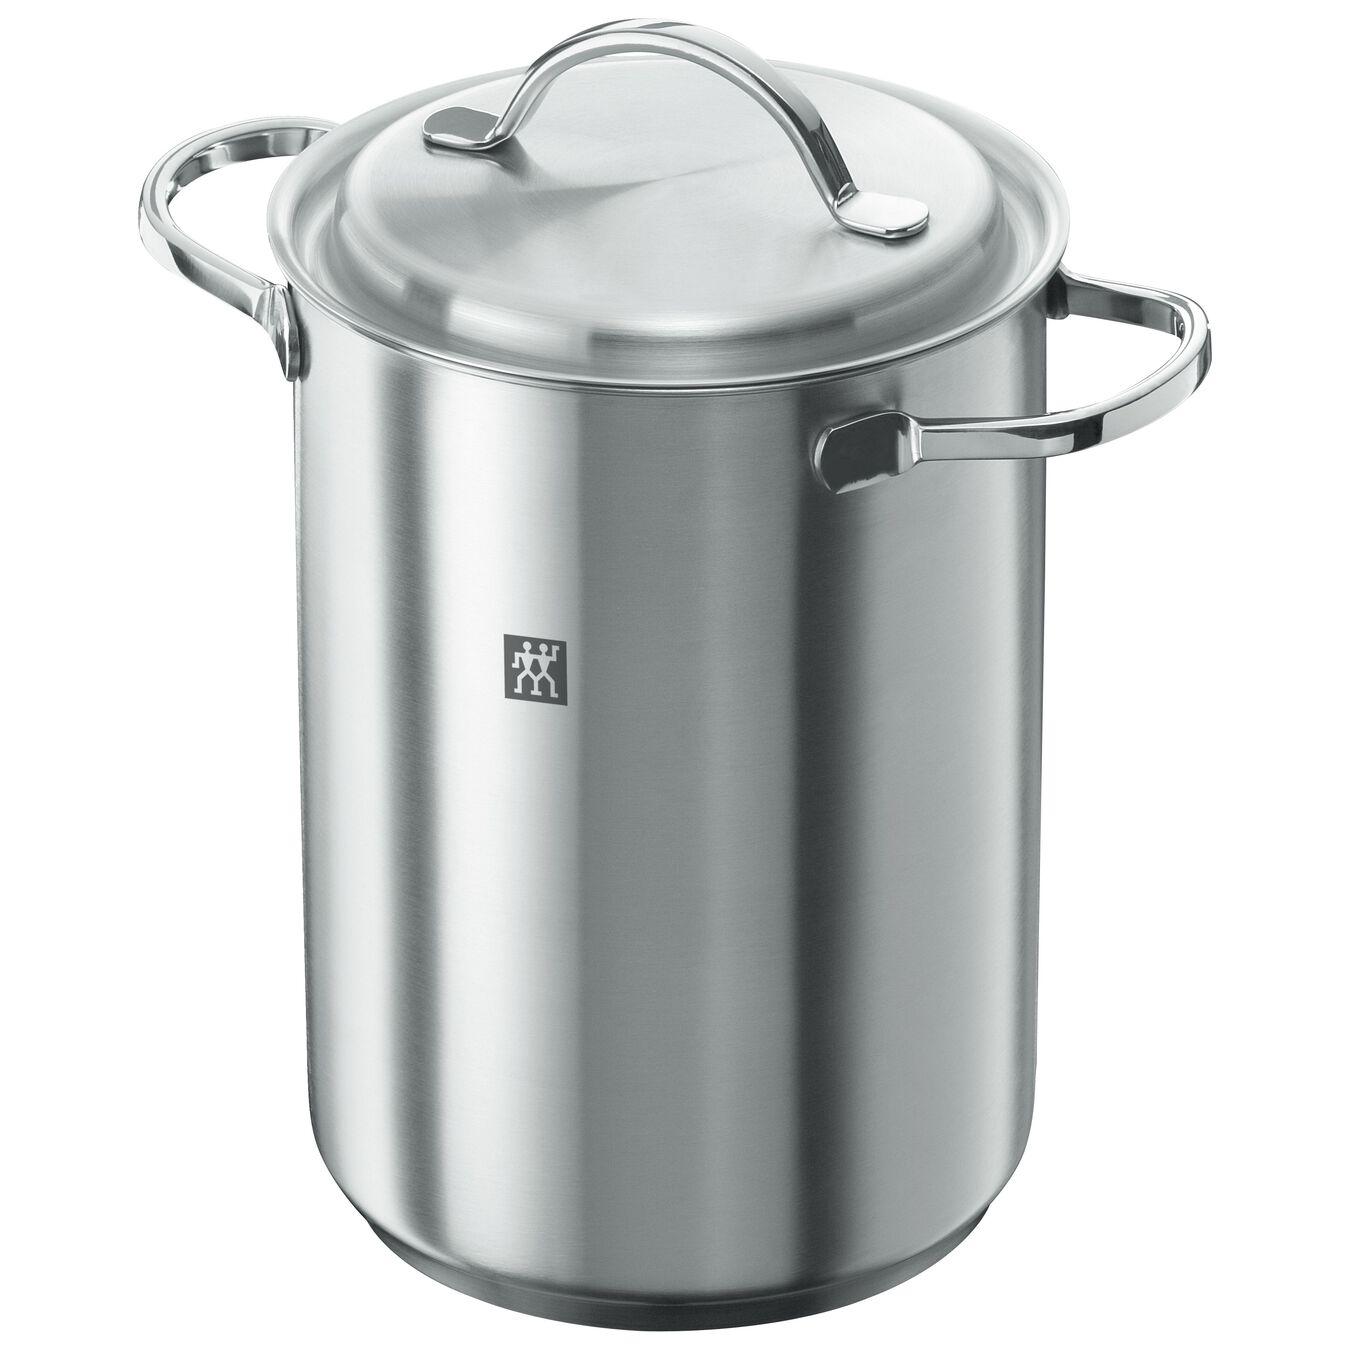 4.5 l 18/10 Stainless Steel Asparagus / Pasta Pot,,large 1